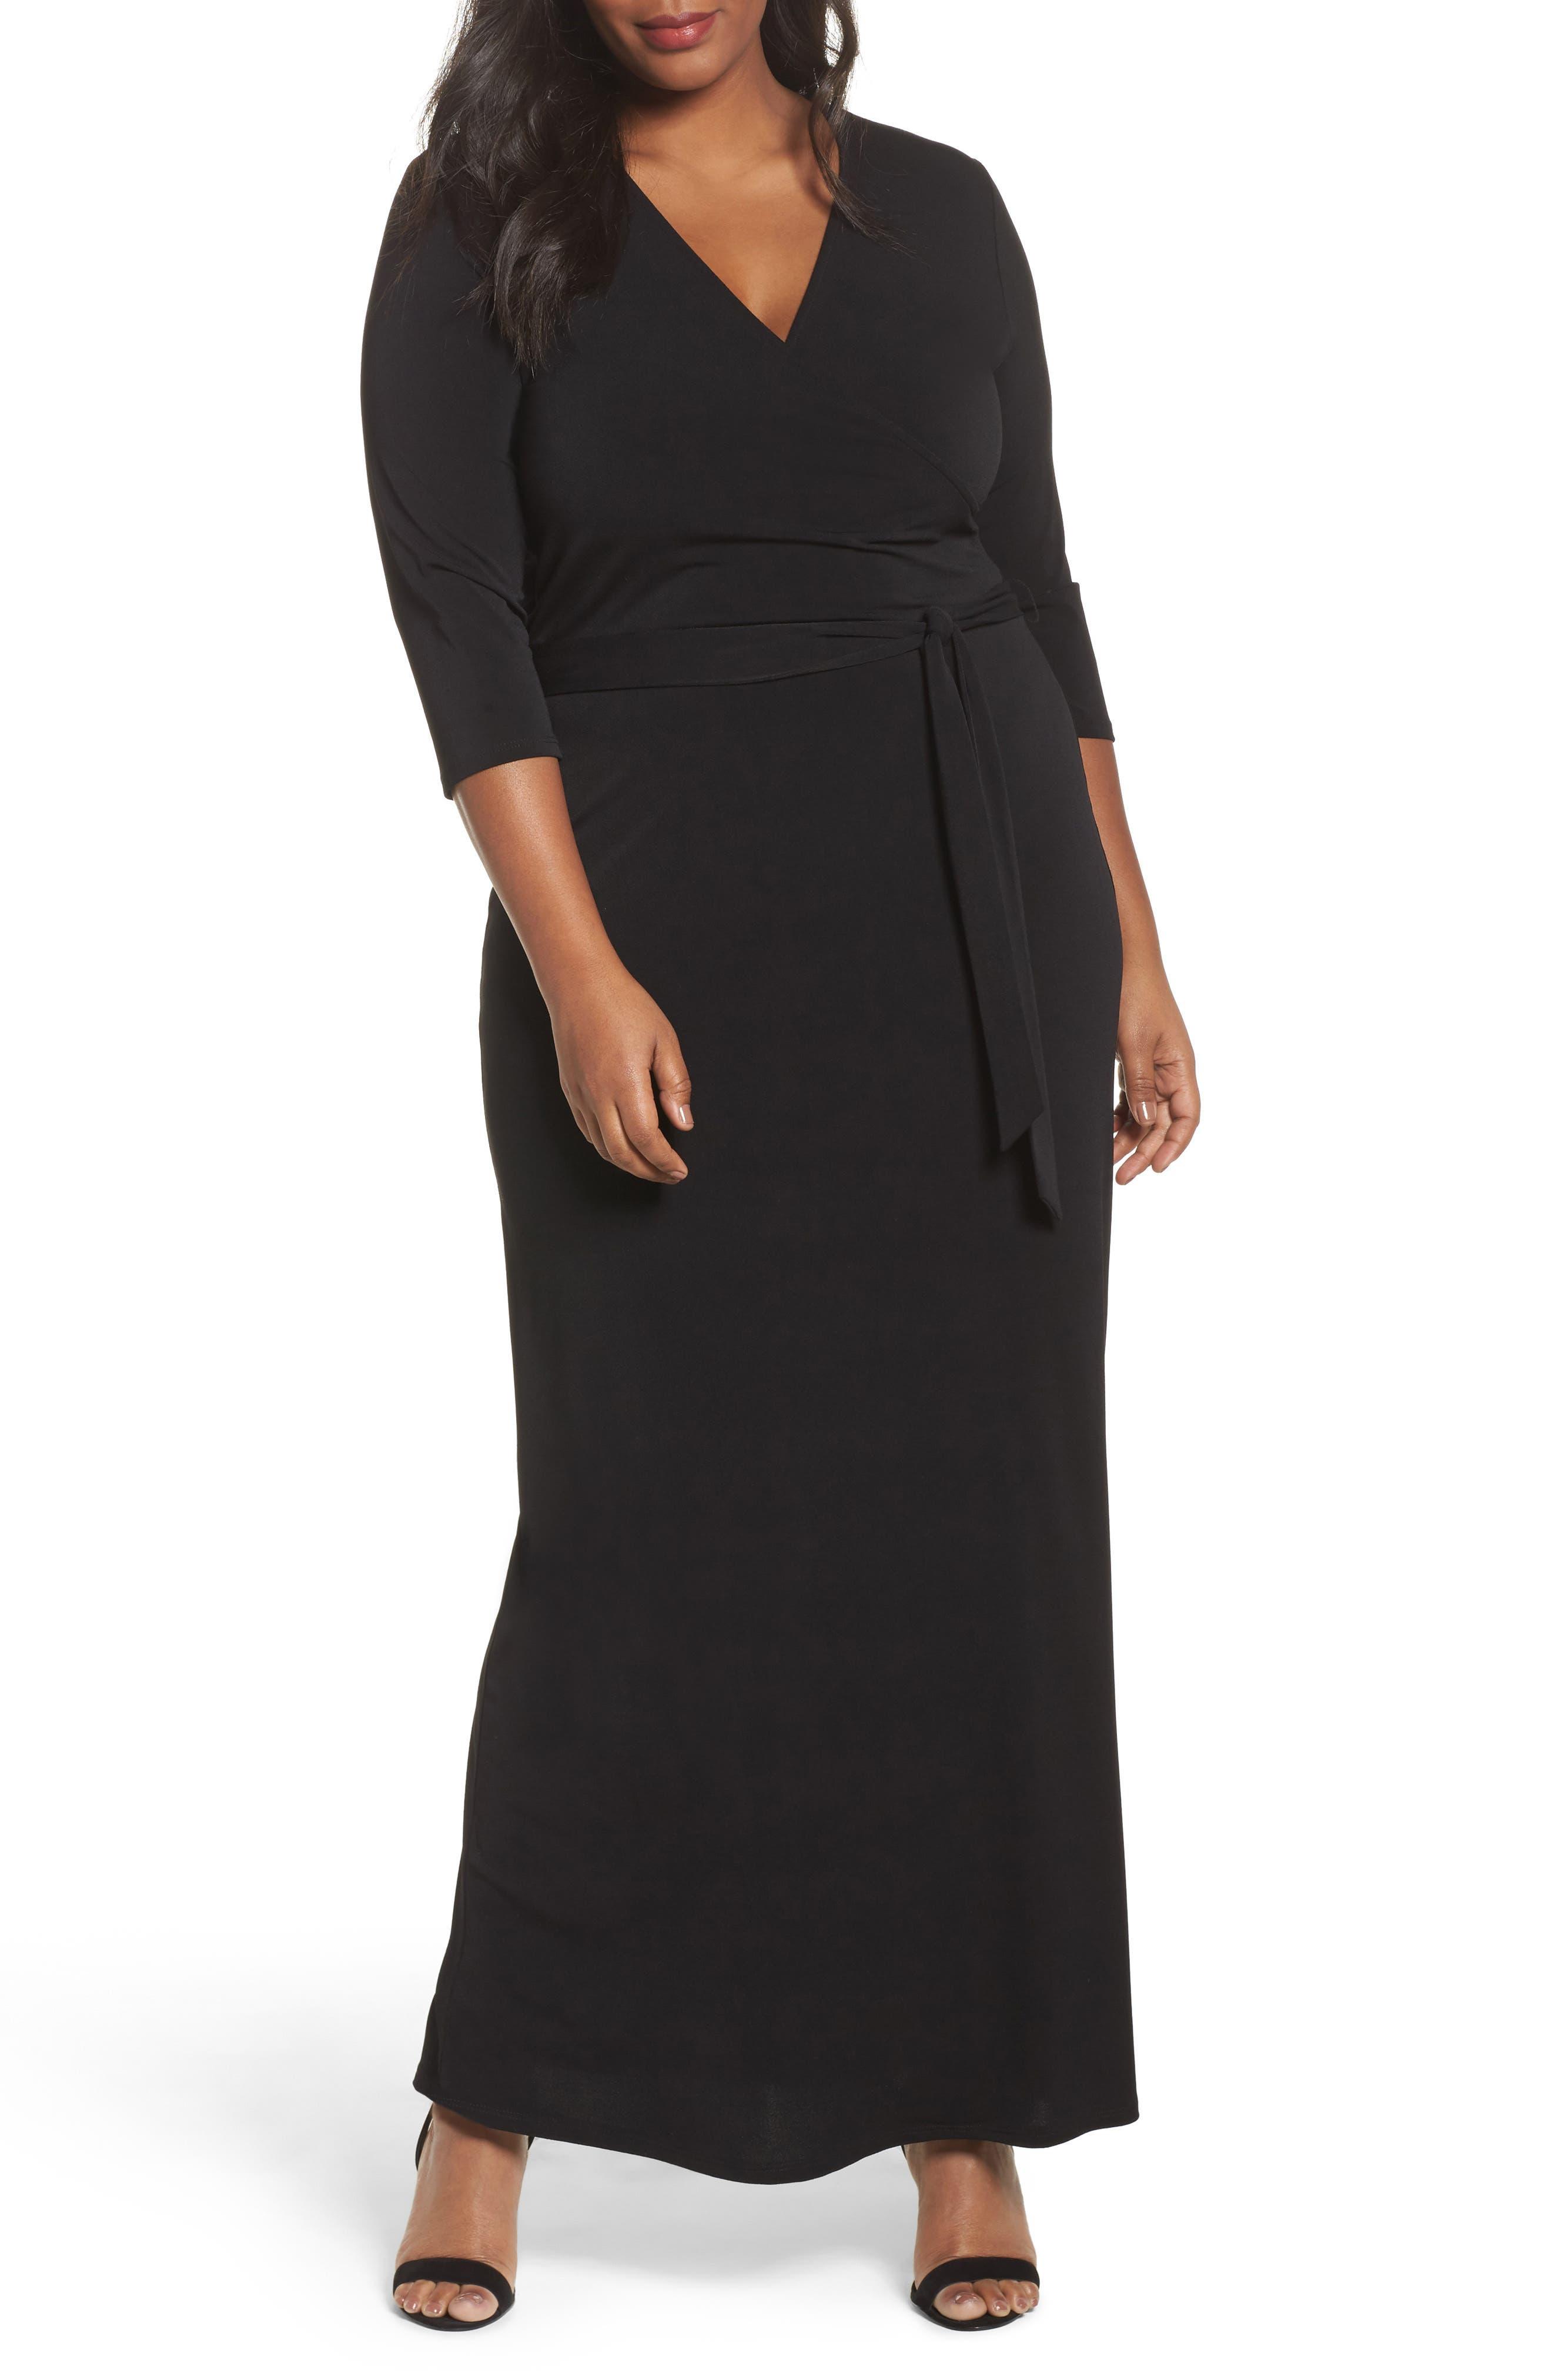 Leota Perfect Faux Wrap Maxi Dress (Plus Size)